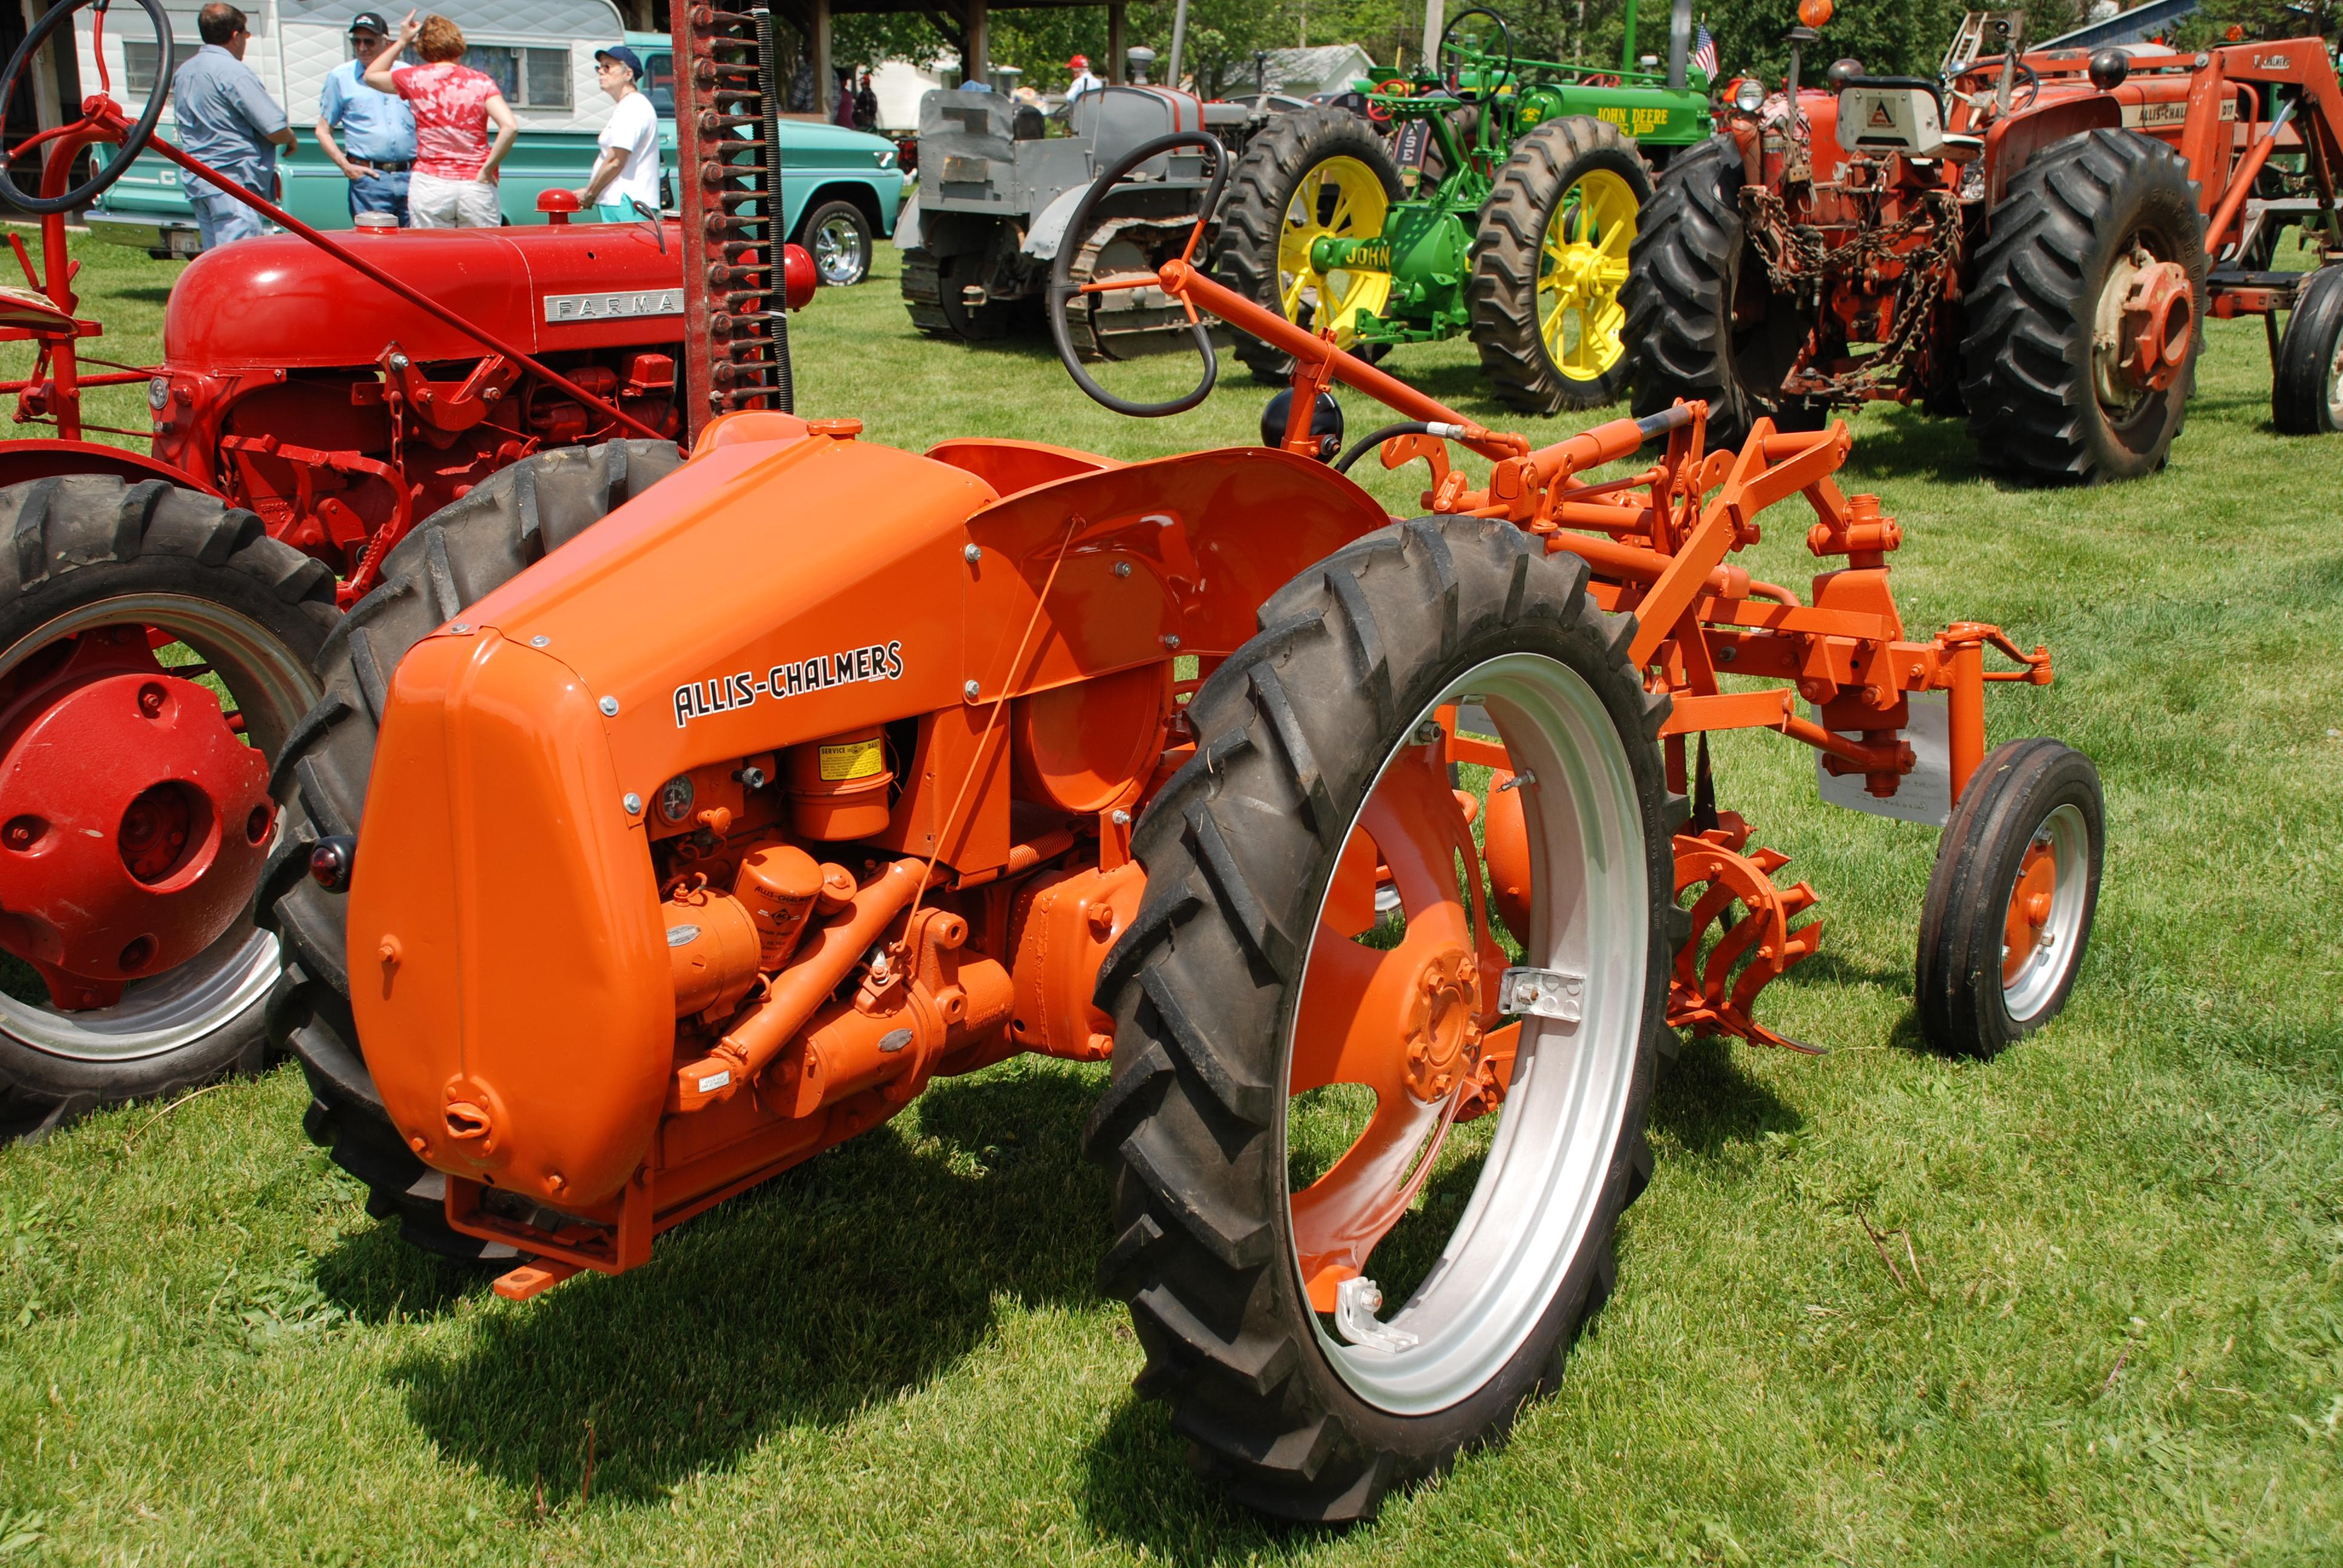 Allis Chalmers G Farm Tractor | Allis Chalmers Farm Tractors